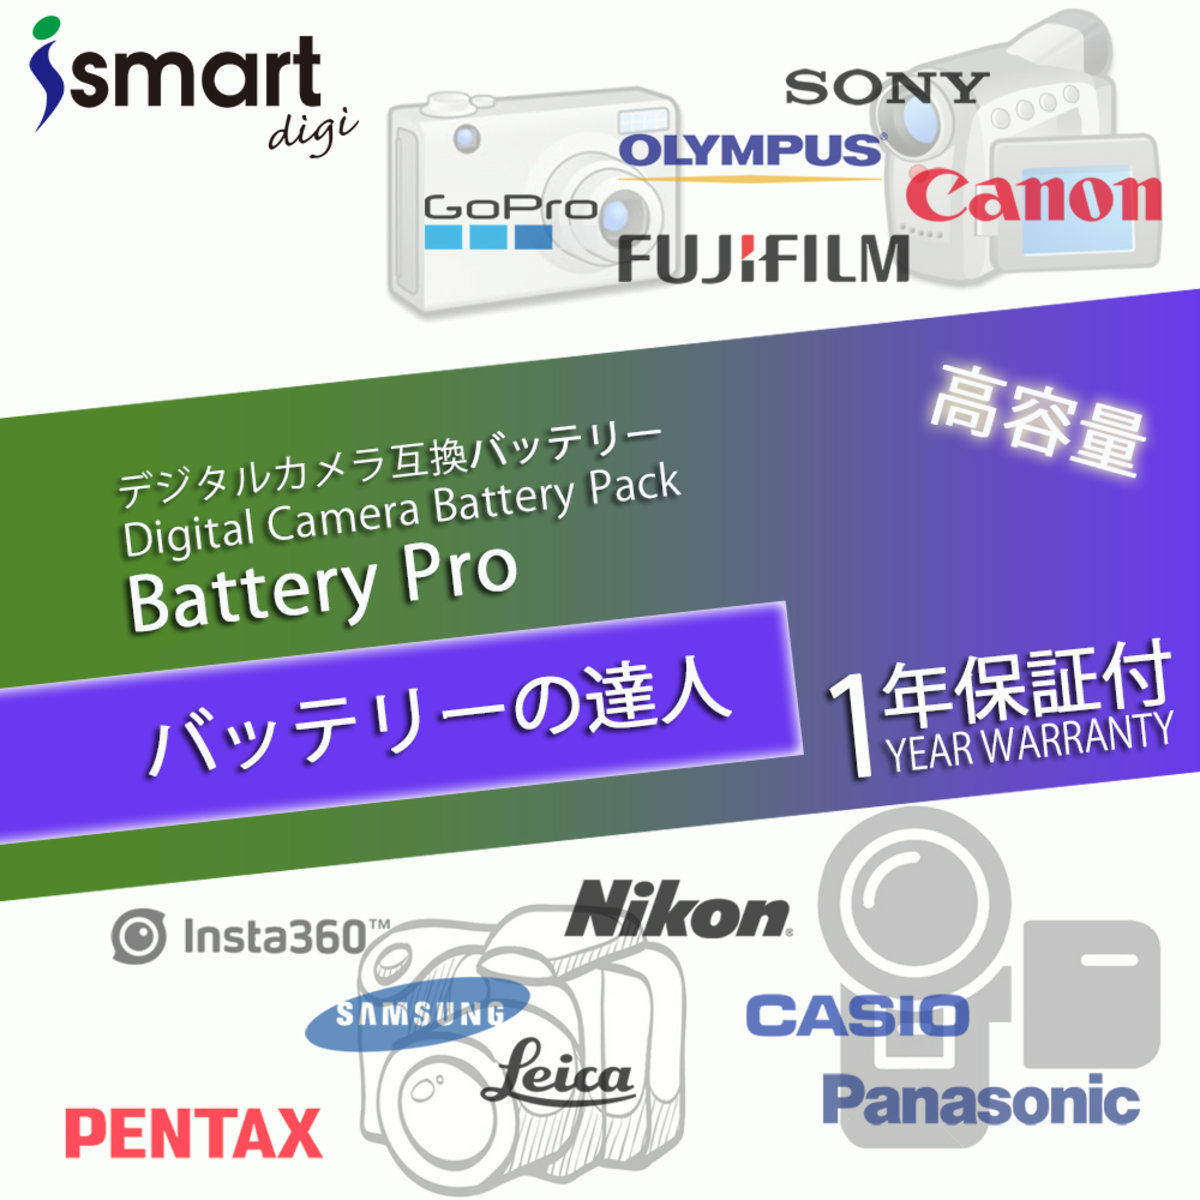 Sony Digital Camera Battery (For:HDR-CX560V, HDR-HC7, HDR-UX5, HDR-UX7, HDR-HC3, HDR-CX150E, HDR-CX170, HDR-CX350)